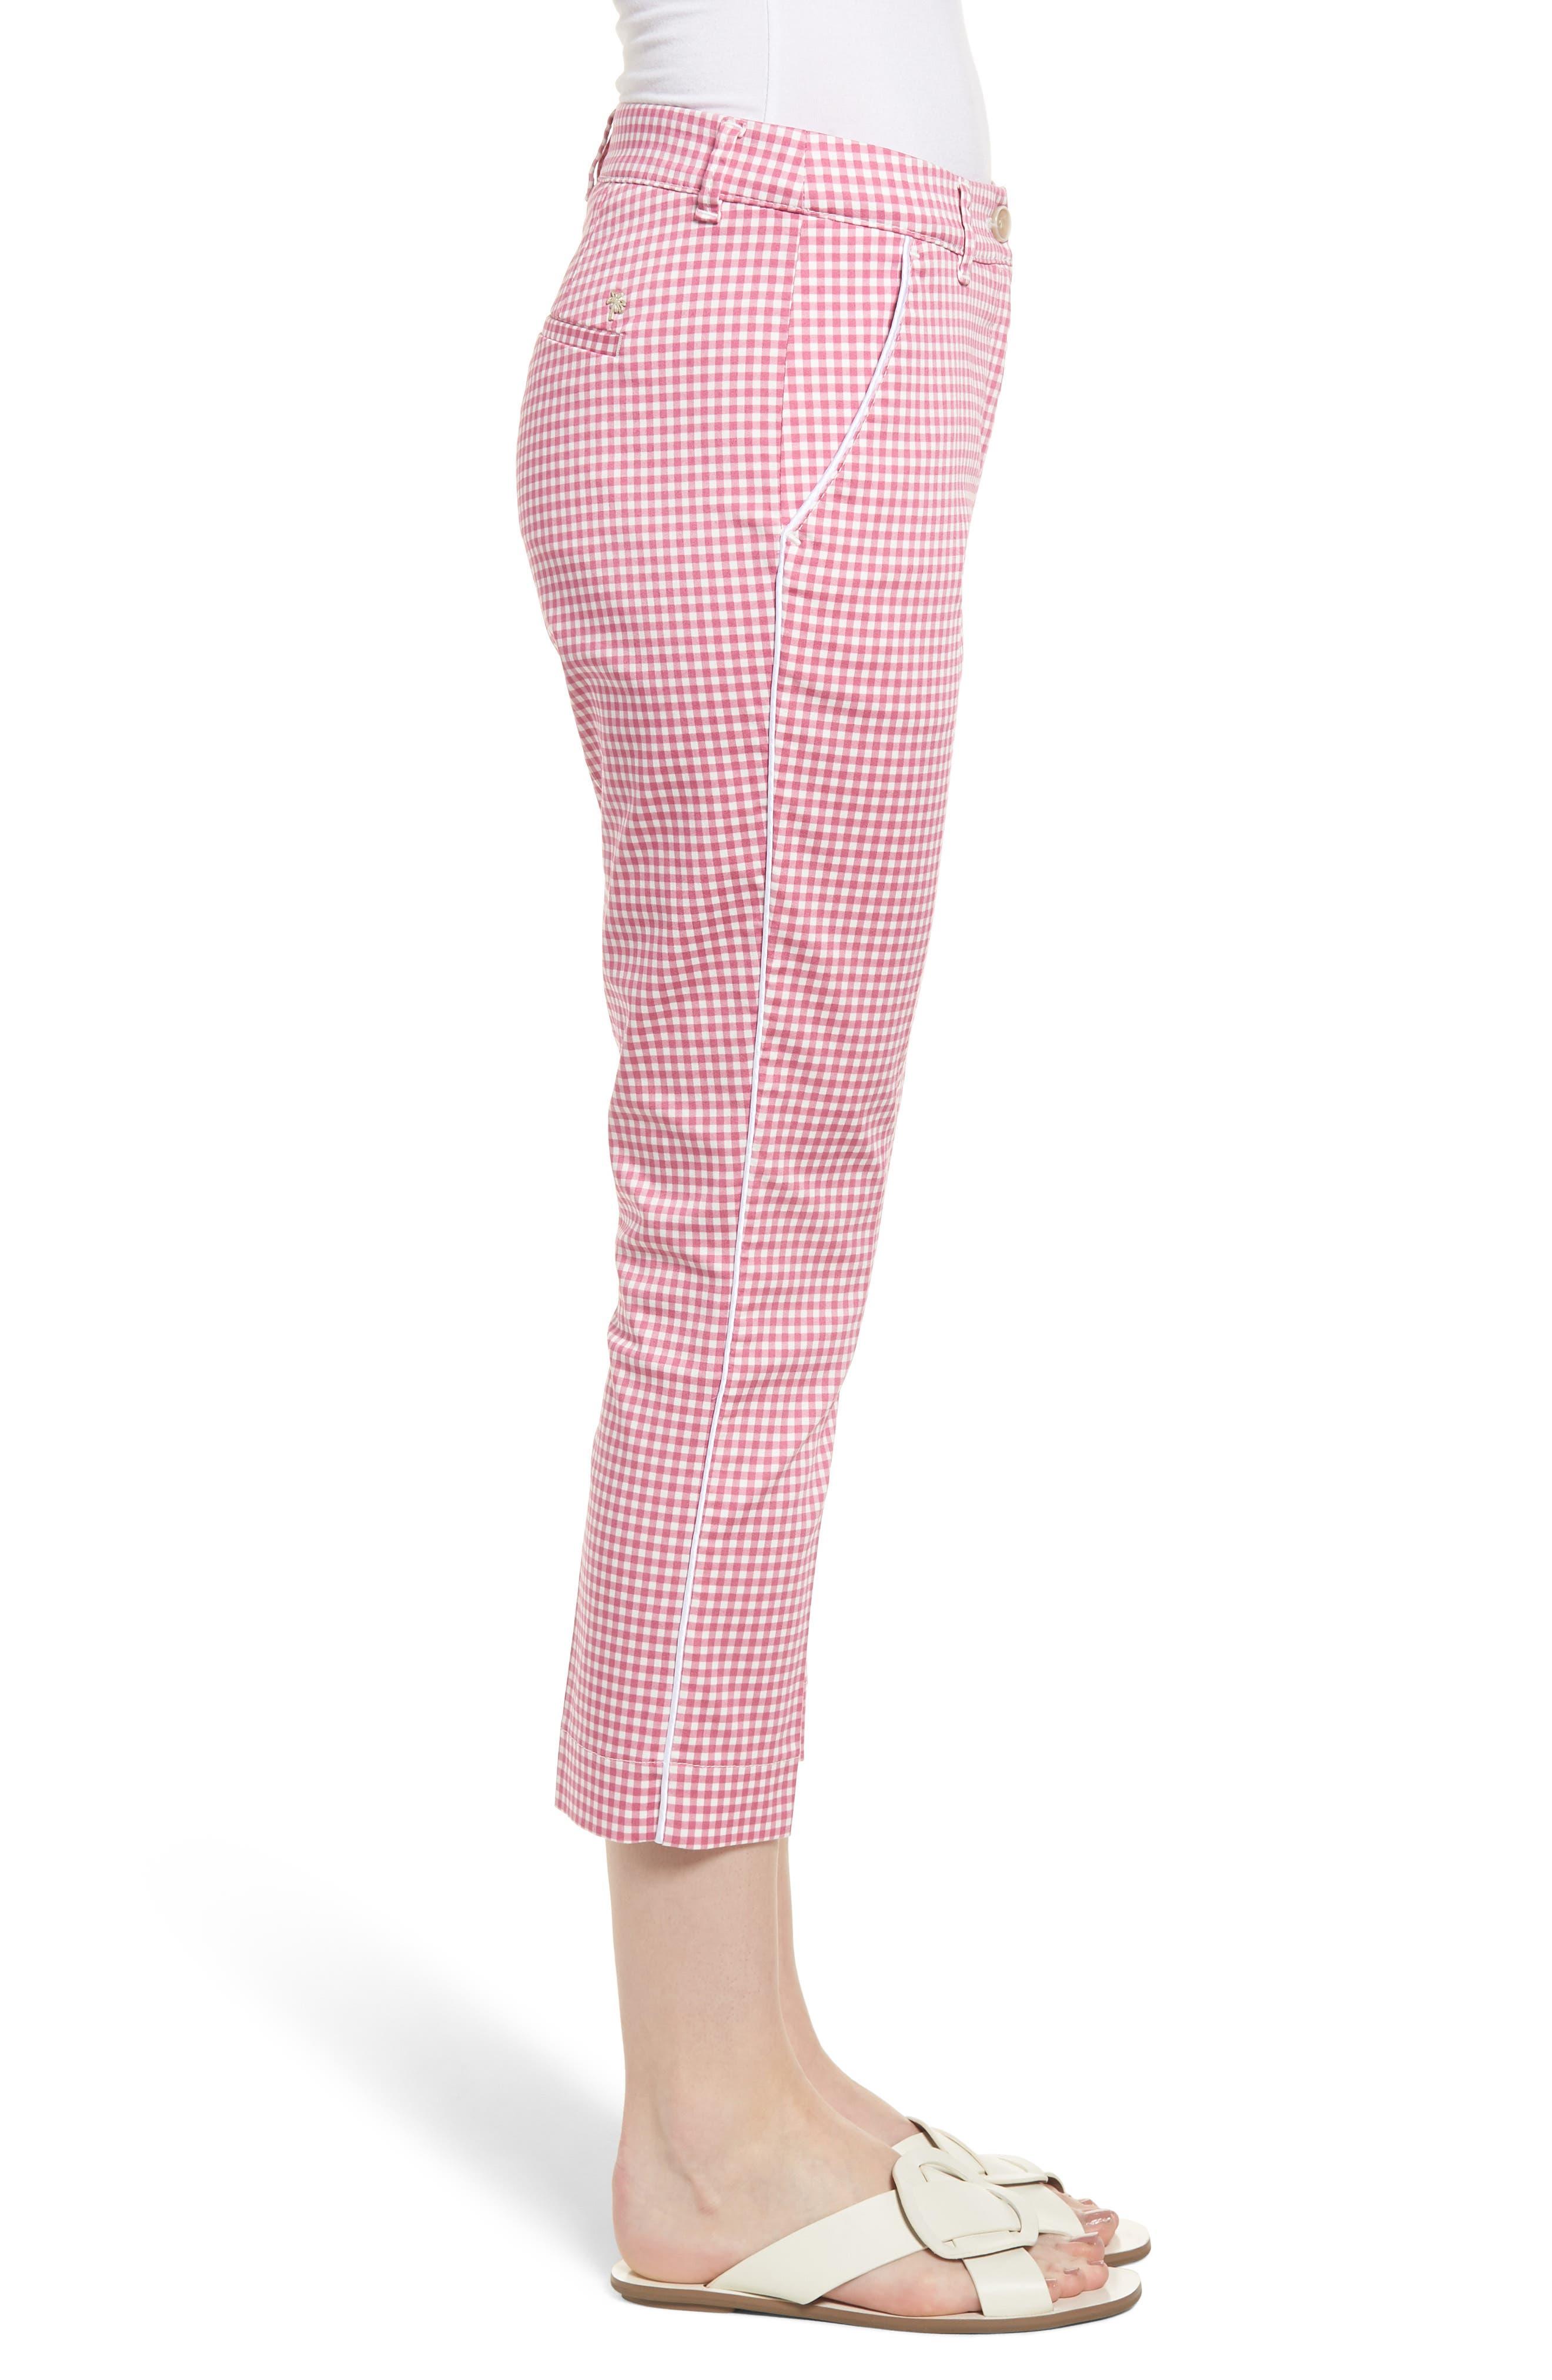 Maron Gingham Stretch Cotton Pants,                             Alternate thumbnail 3, color,